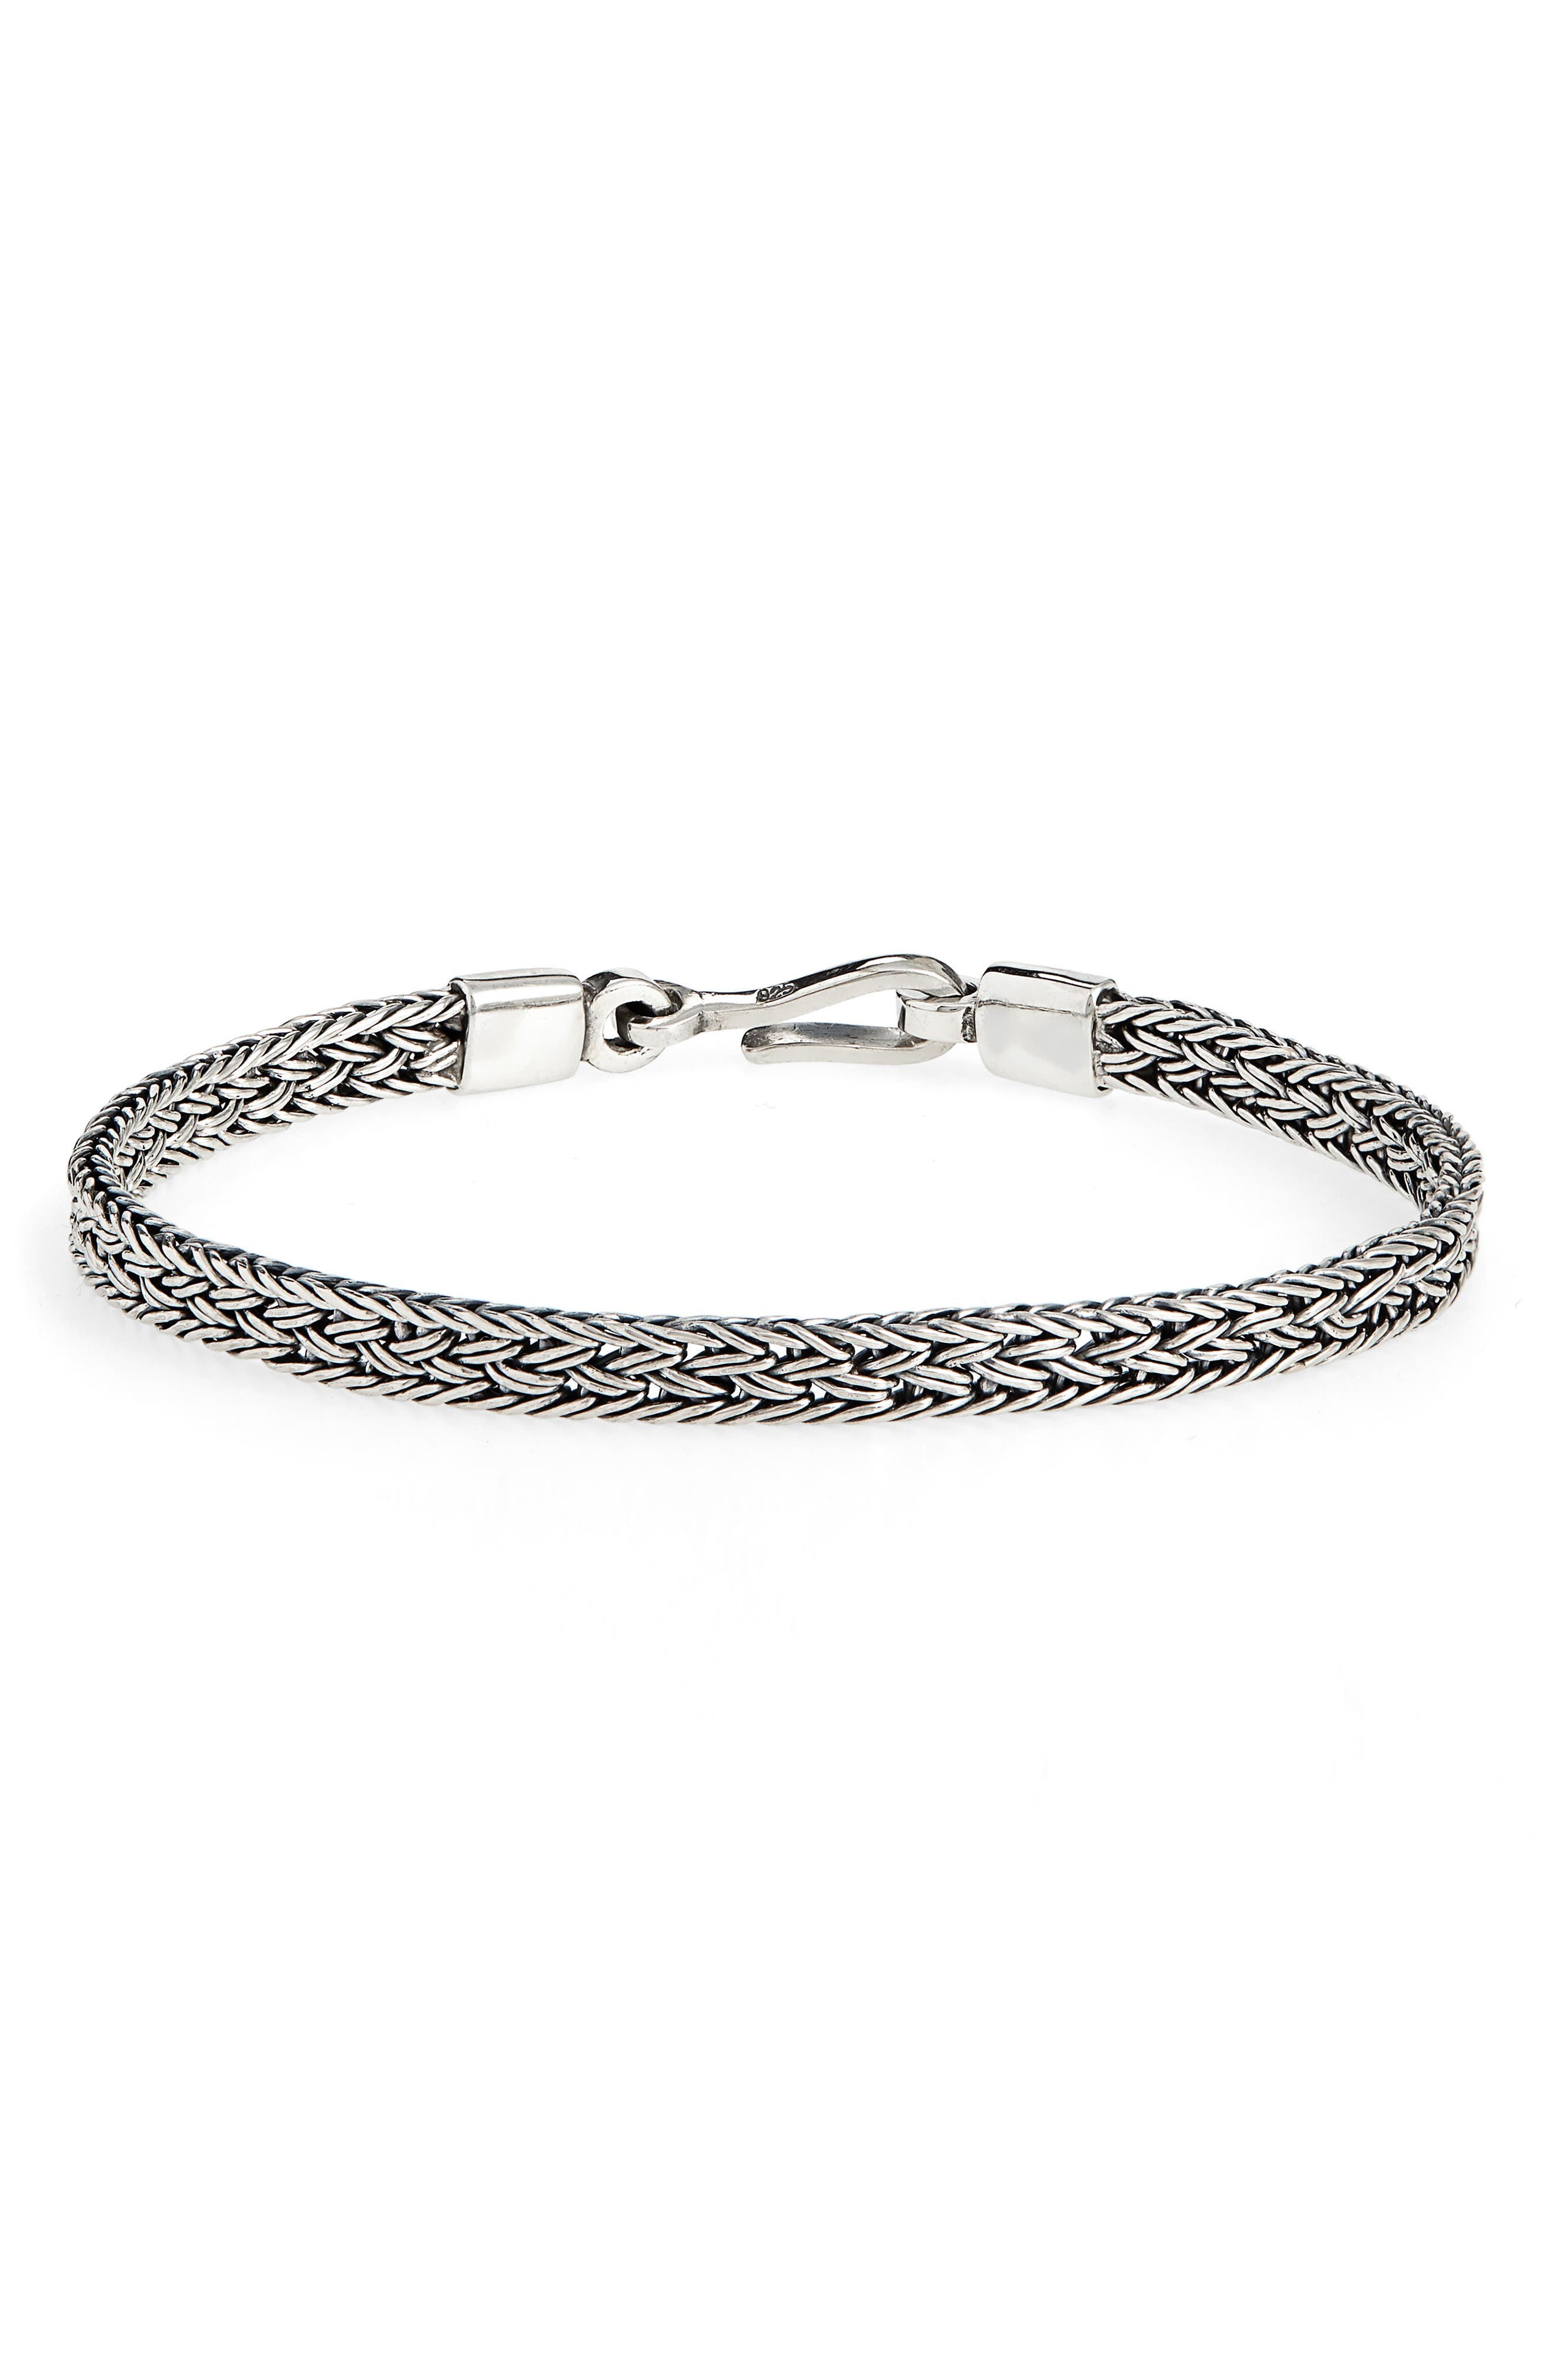 CAPUTO & CO. Artisan Silver Chain Bracelet in Sterling Silver